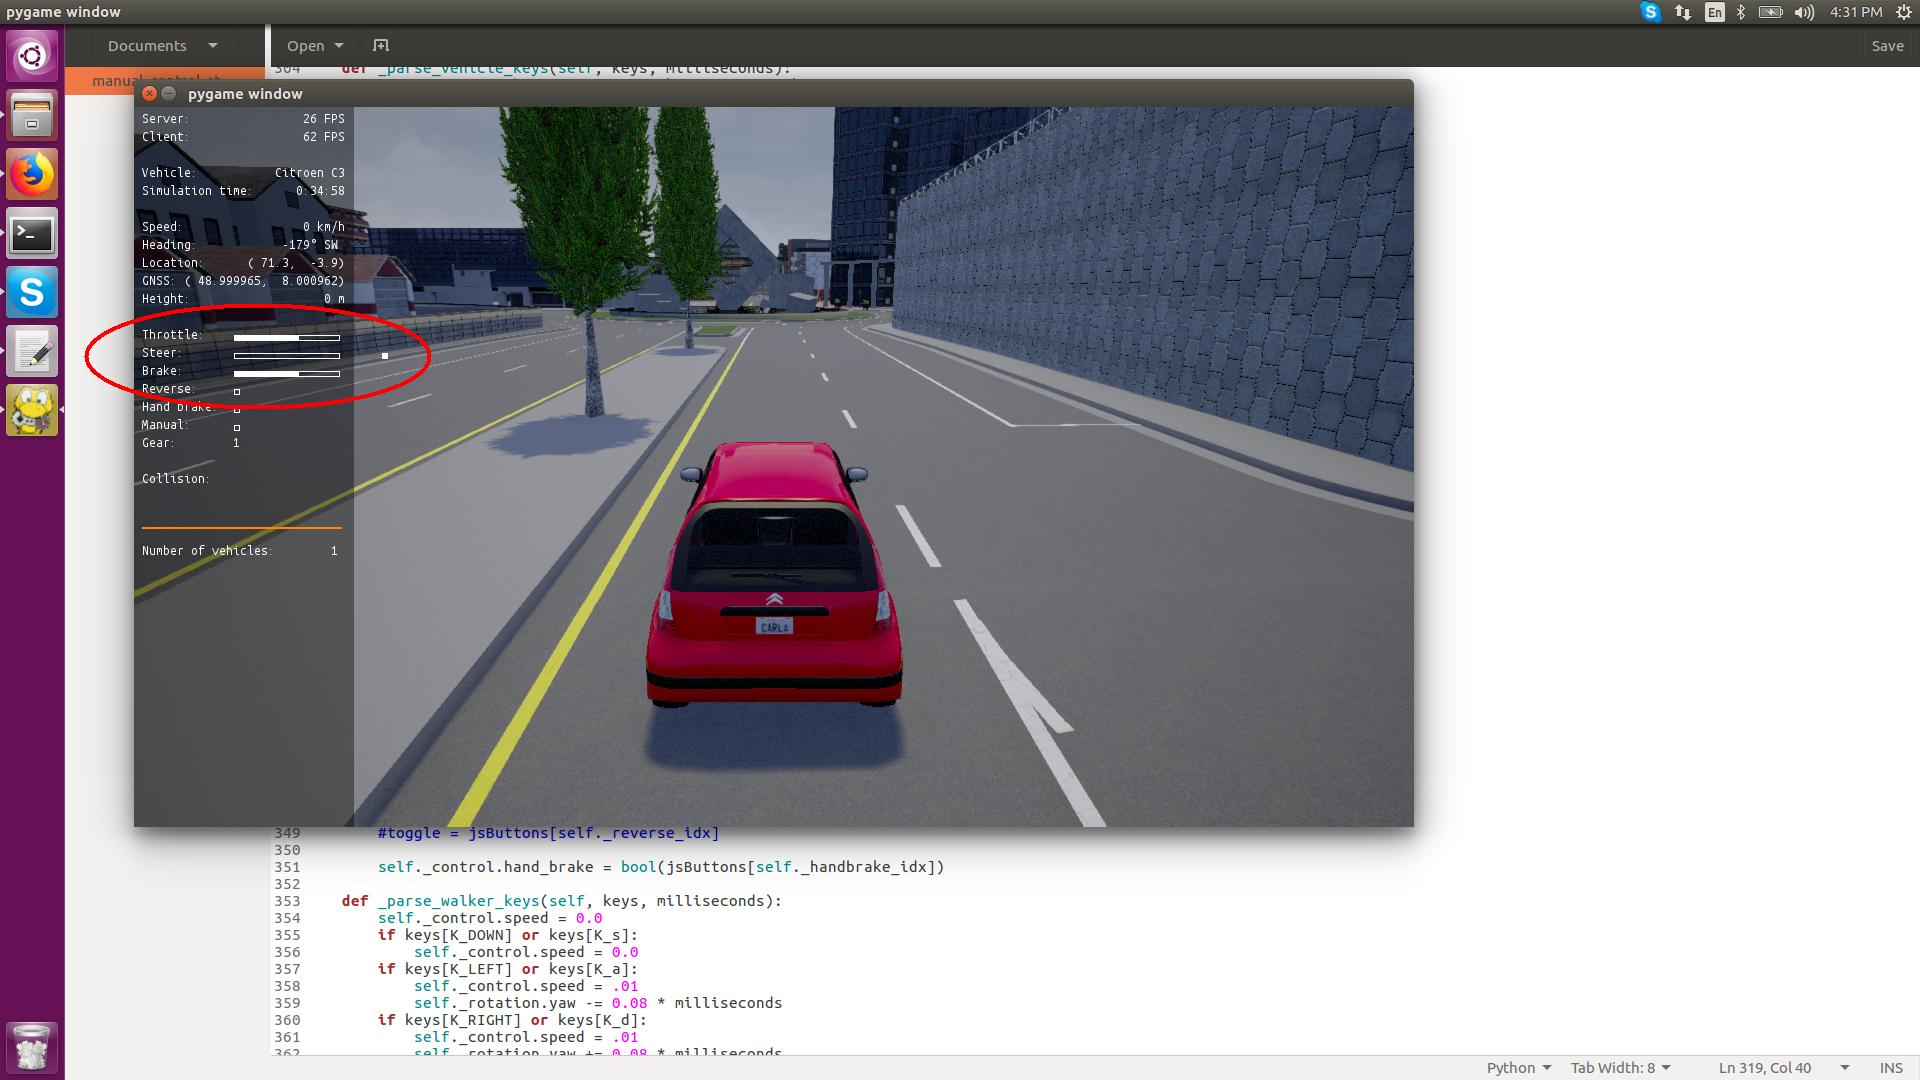 Logitech g29 steering issue · Issue #1521 · carla-simulator